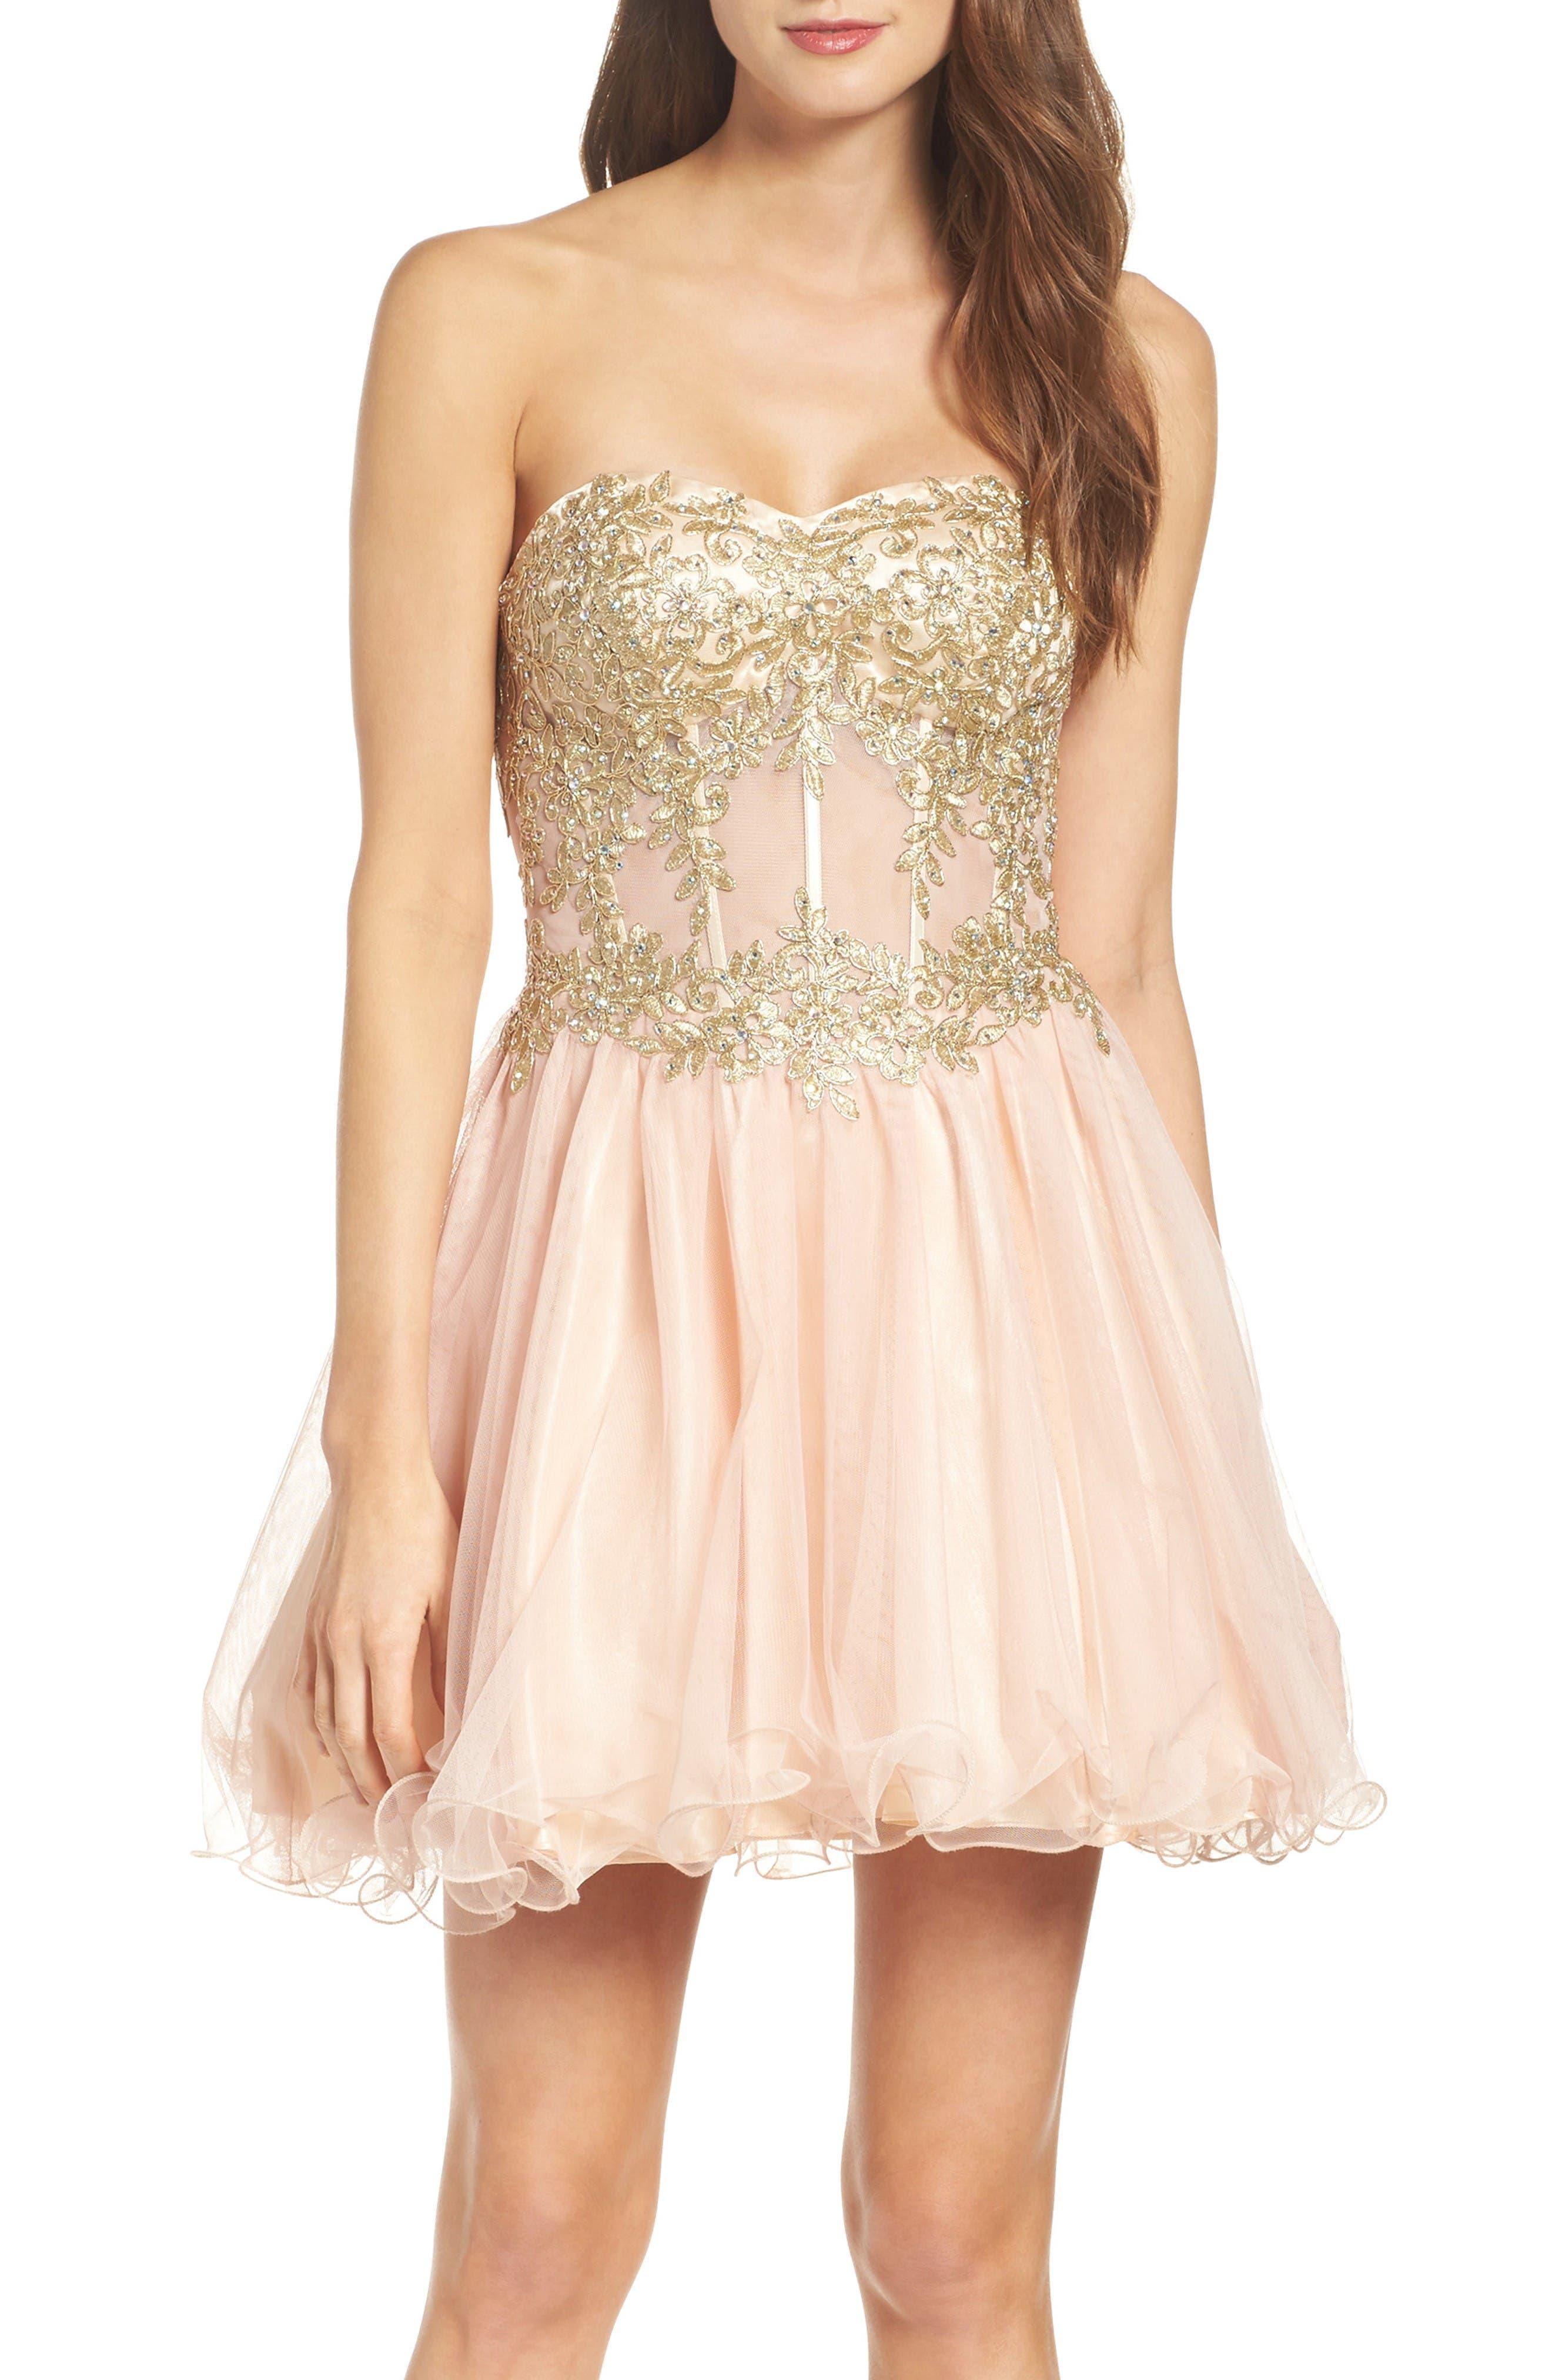 Alternate Image 1 Selected - Blondie Nites Strapless Bustier Dress